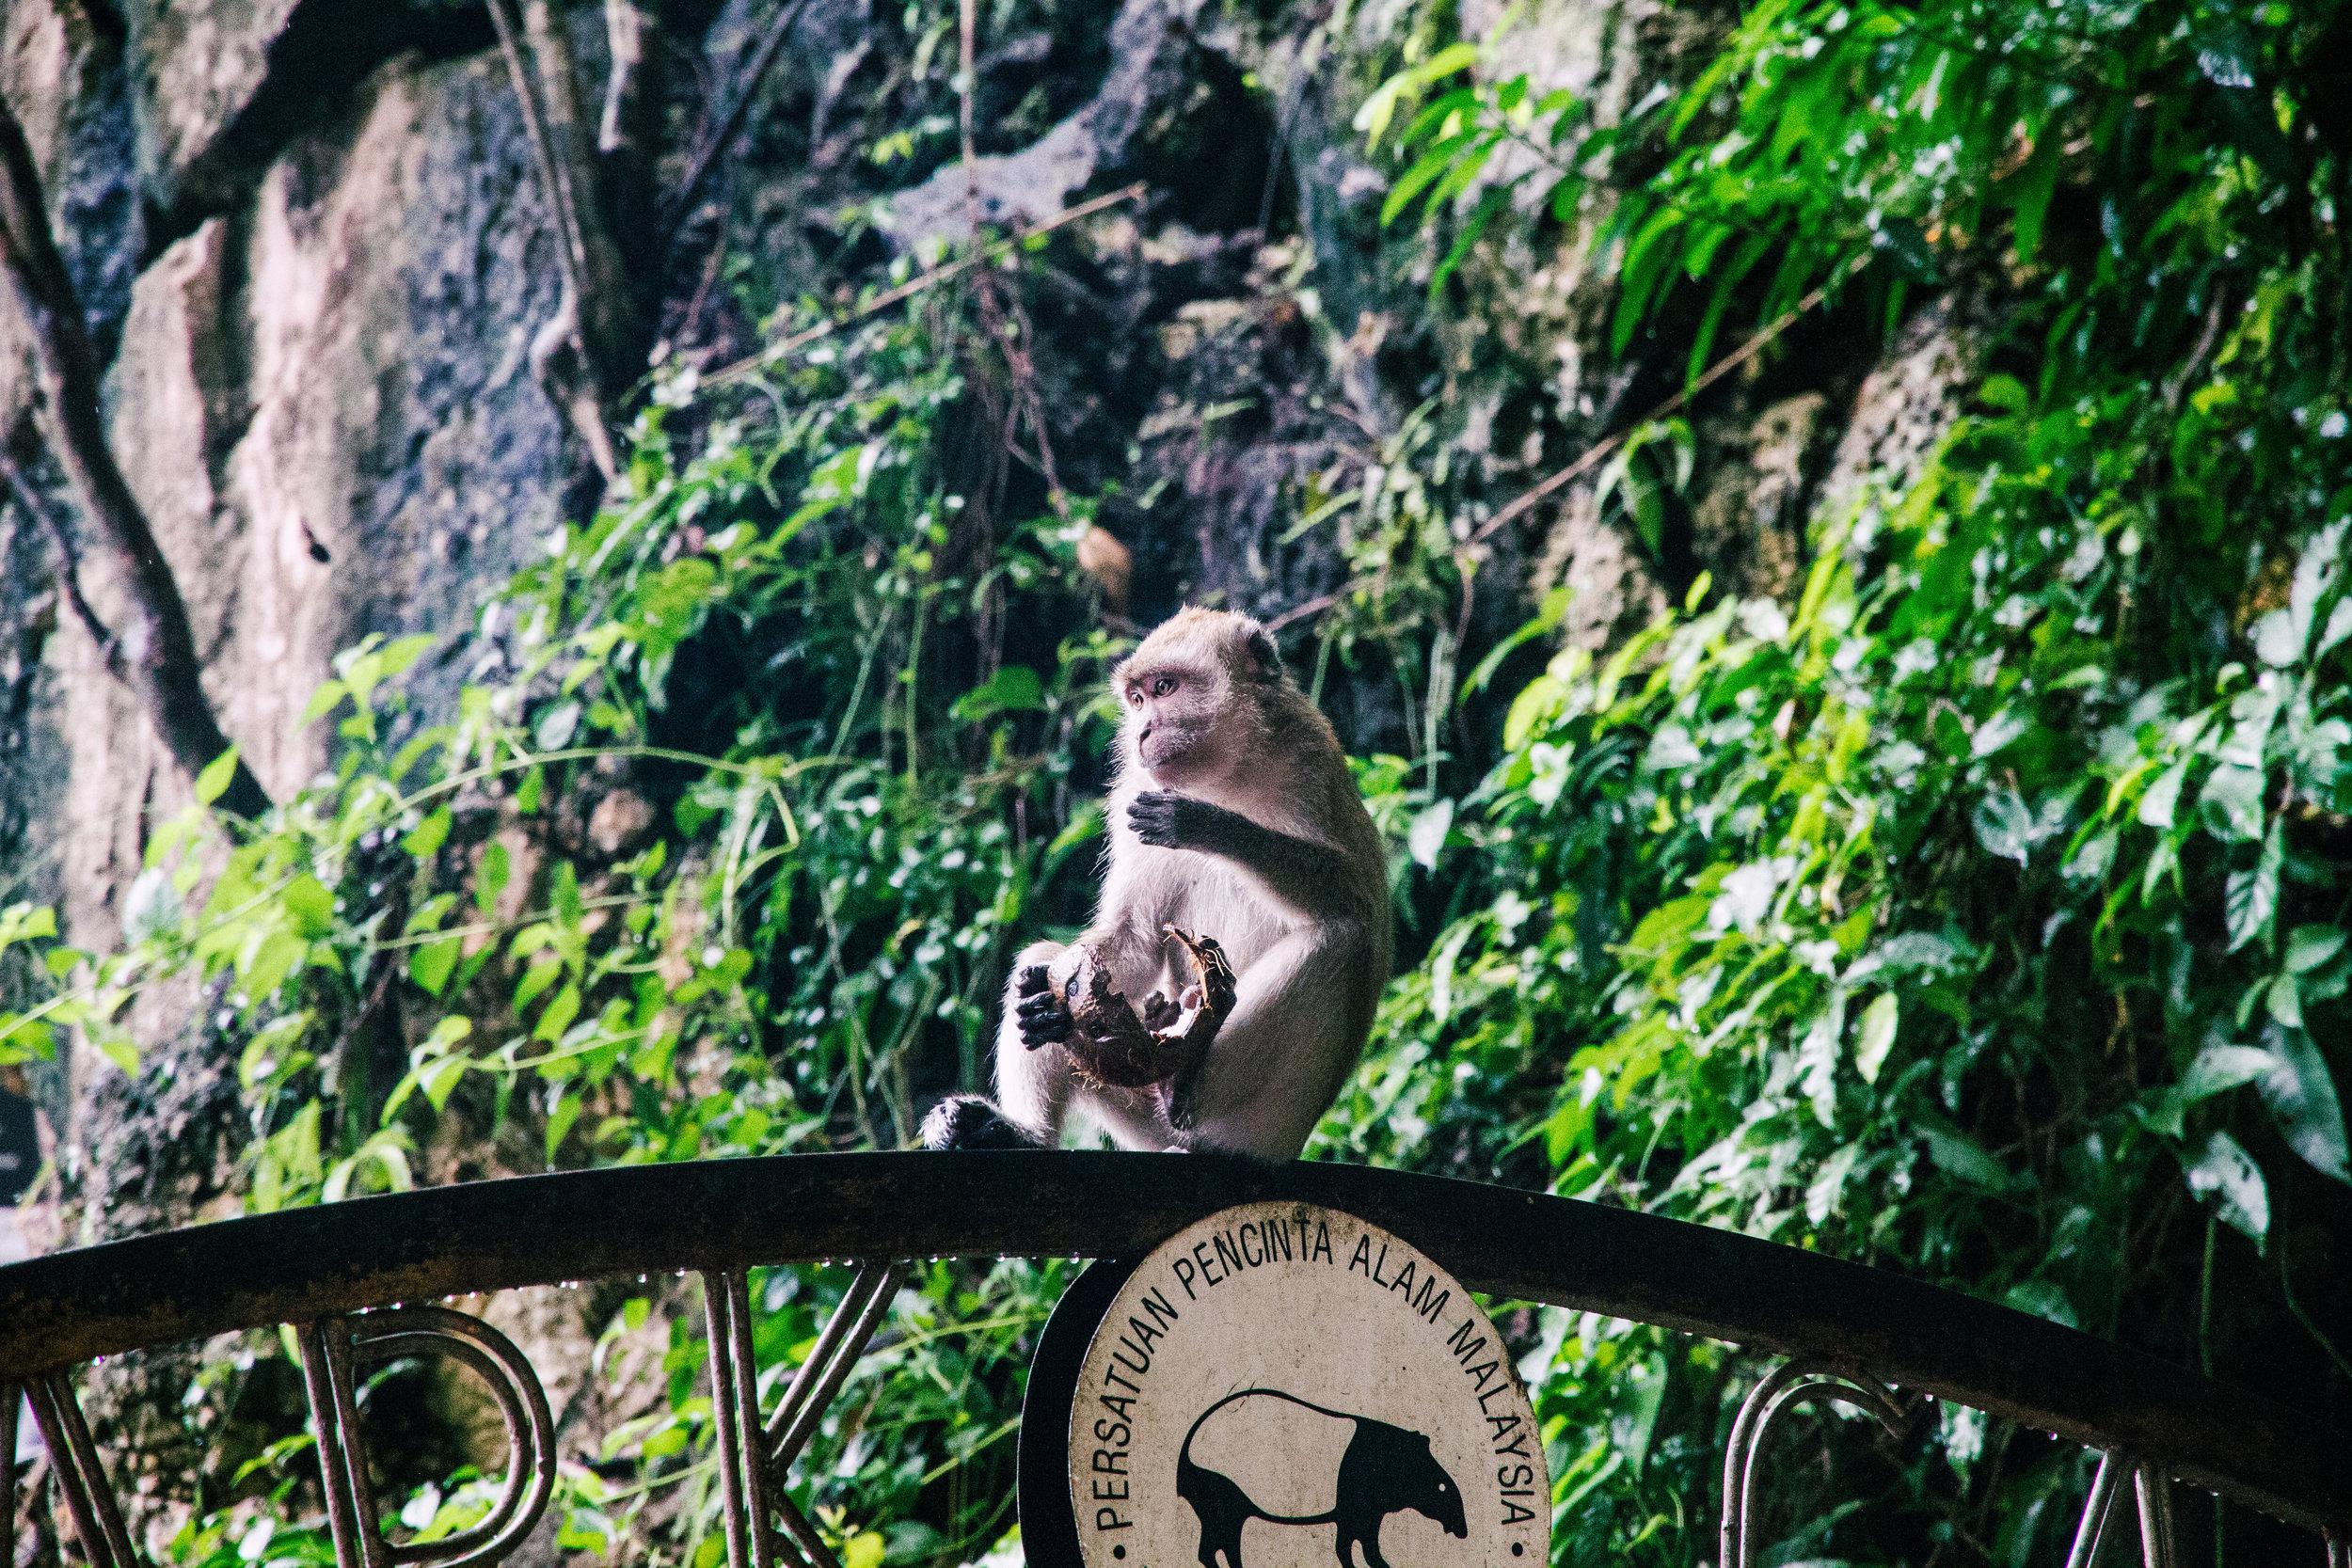 batu caves kl kuala lumpur monkeys